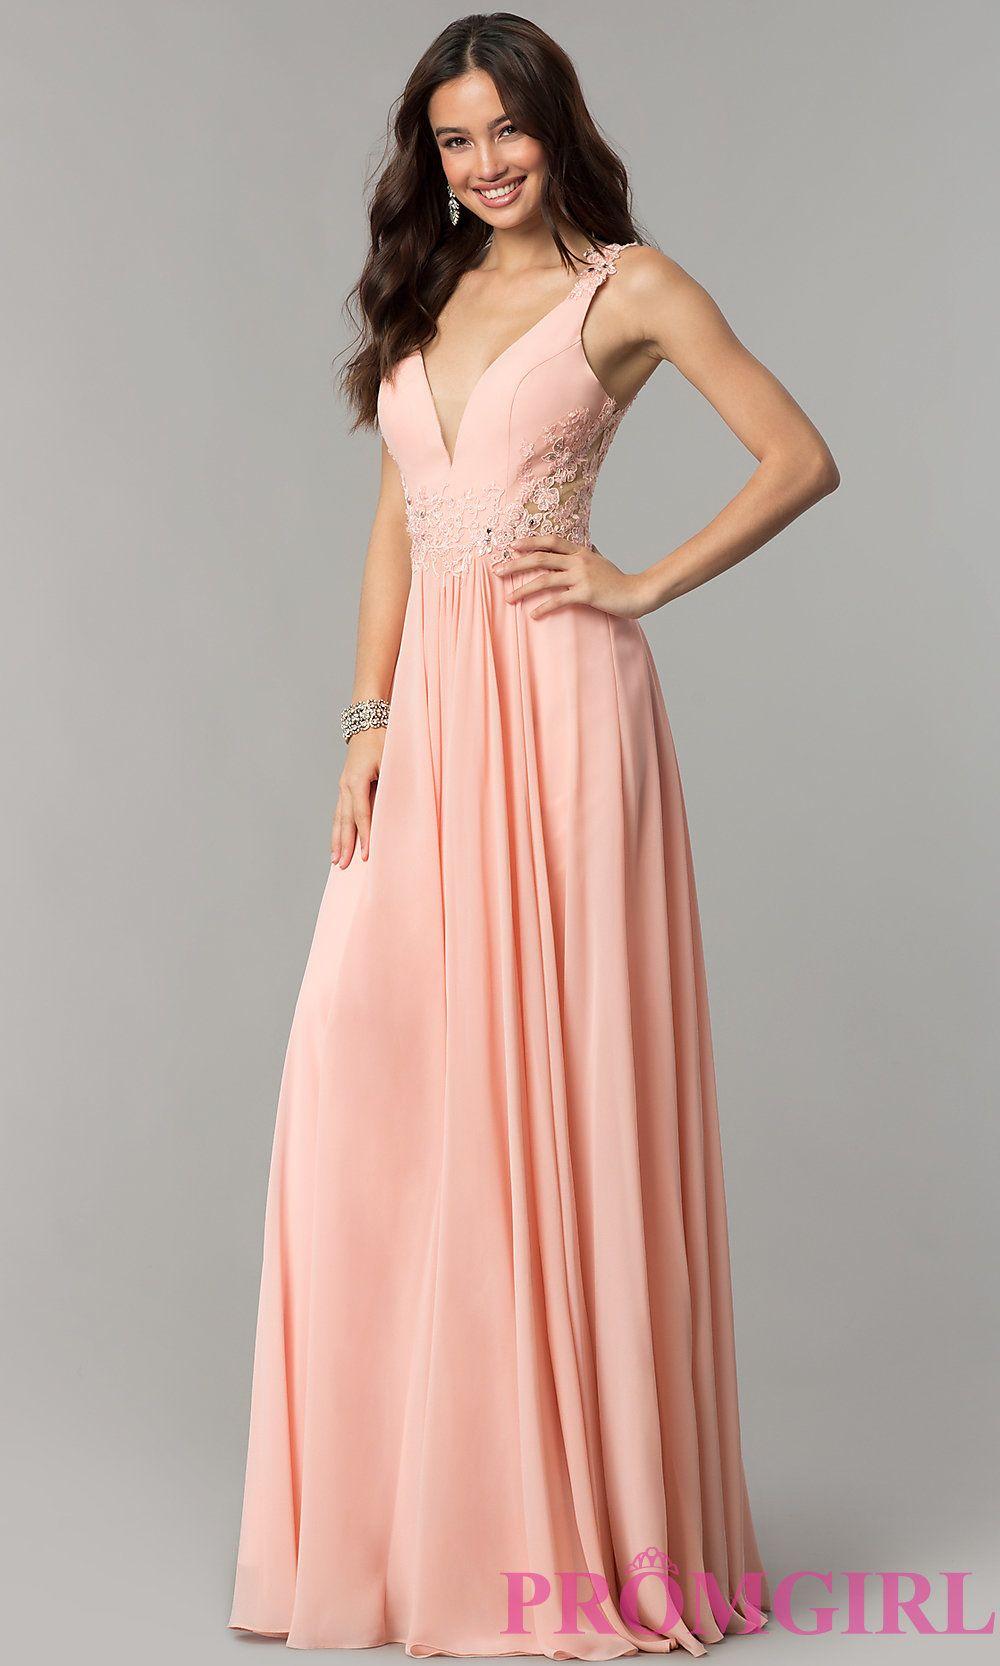 V-Neck Lace-Applique Long Chiffon Prom Dress -PromGirl